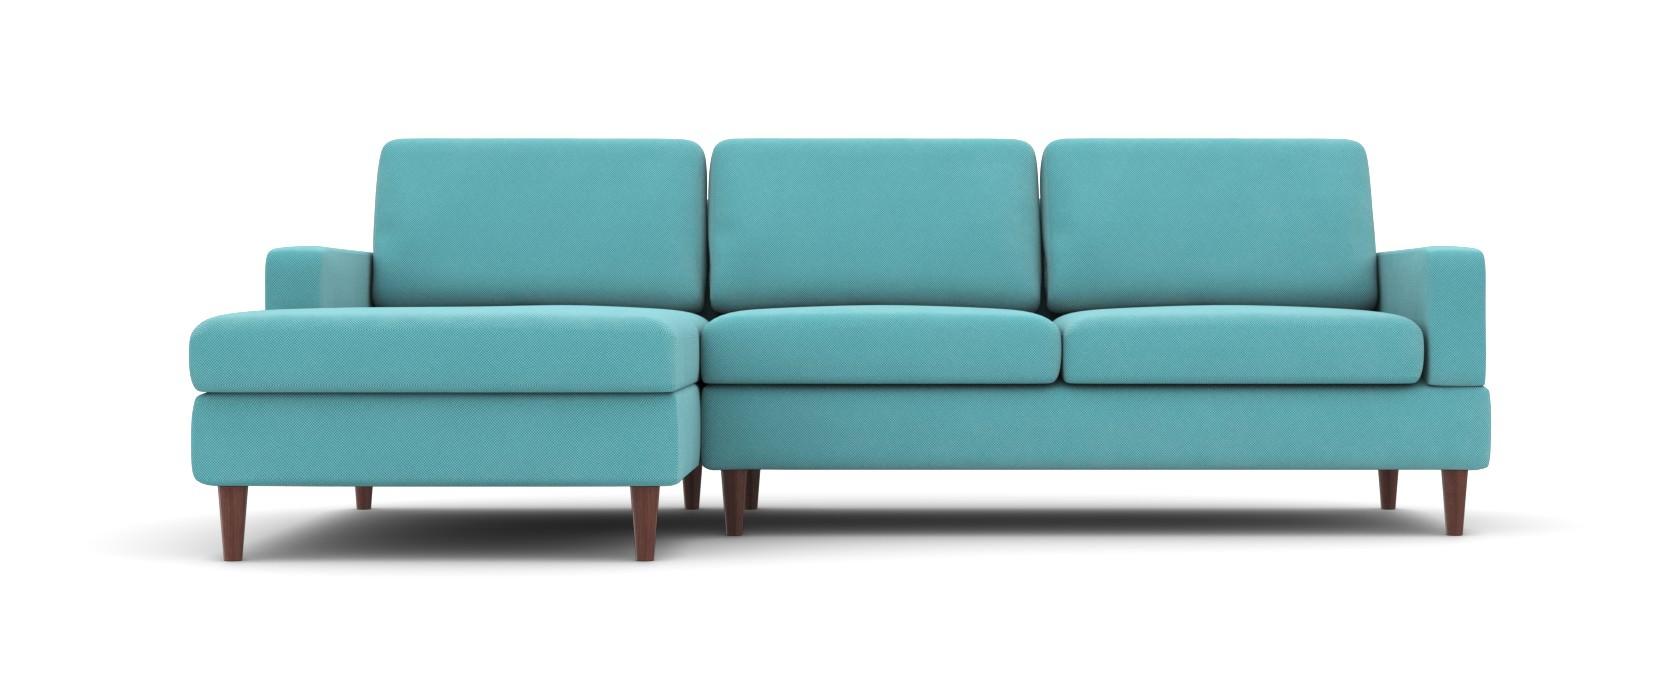 Угловой диван Bruno - Pufetto